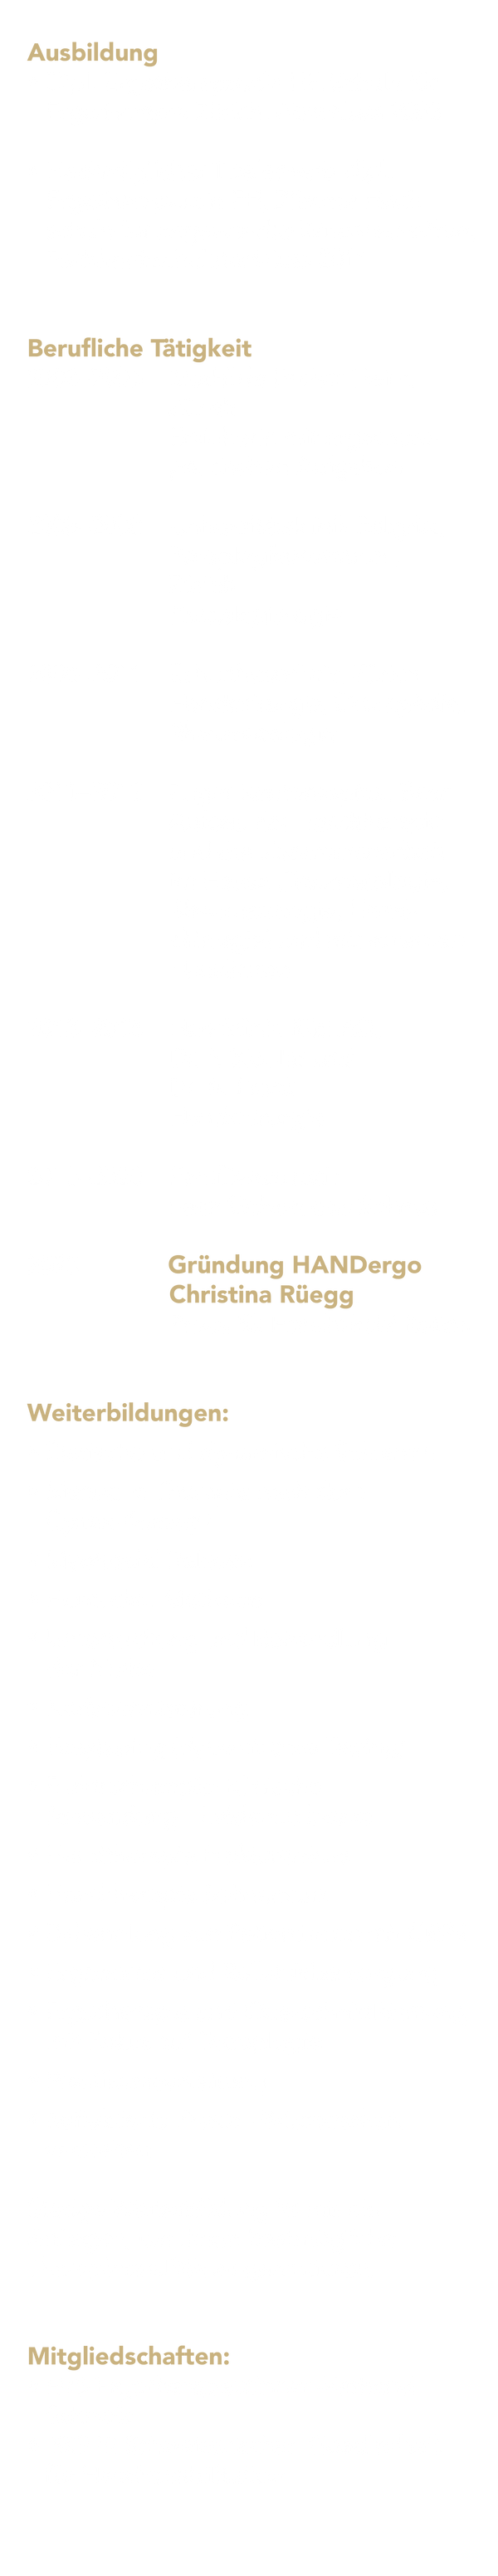 Lebenslauf_Website_2.png